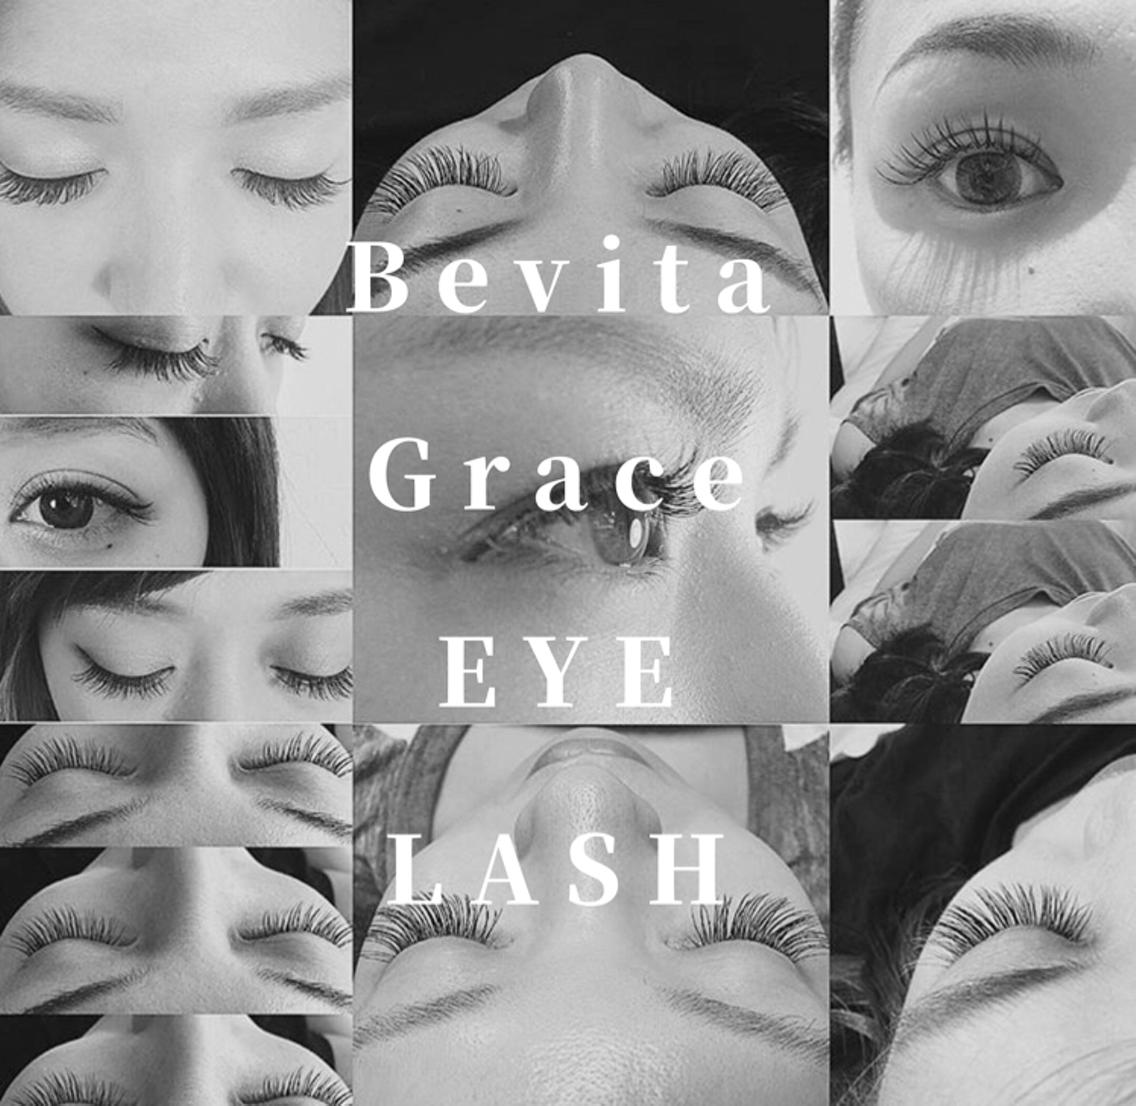 Bevita Grace所属・BevitGrace eyelashの掲載